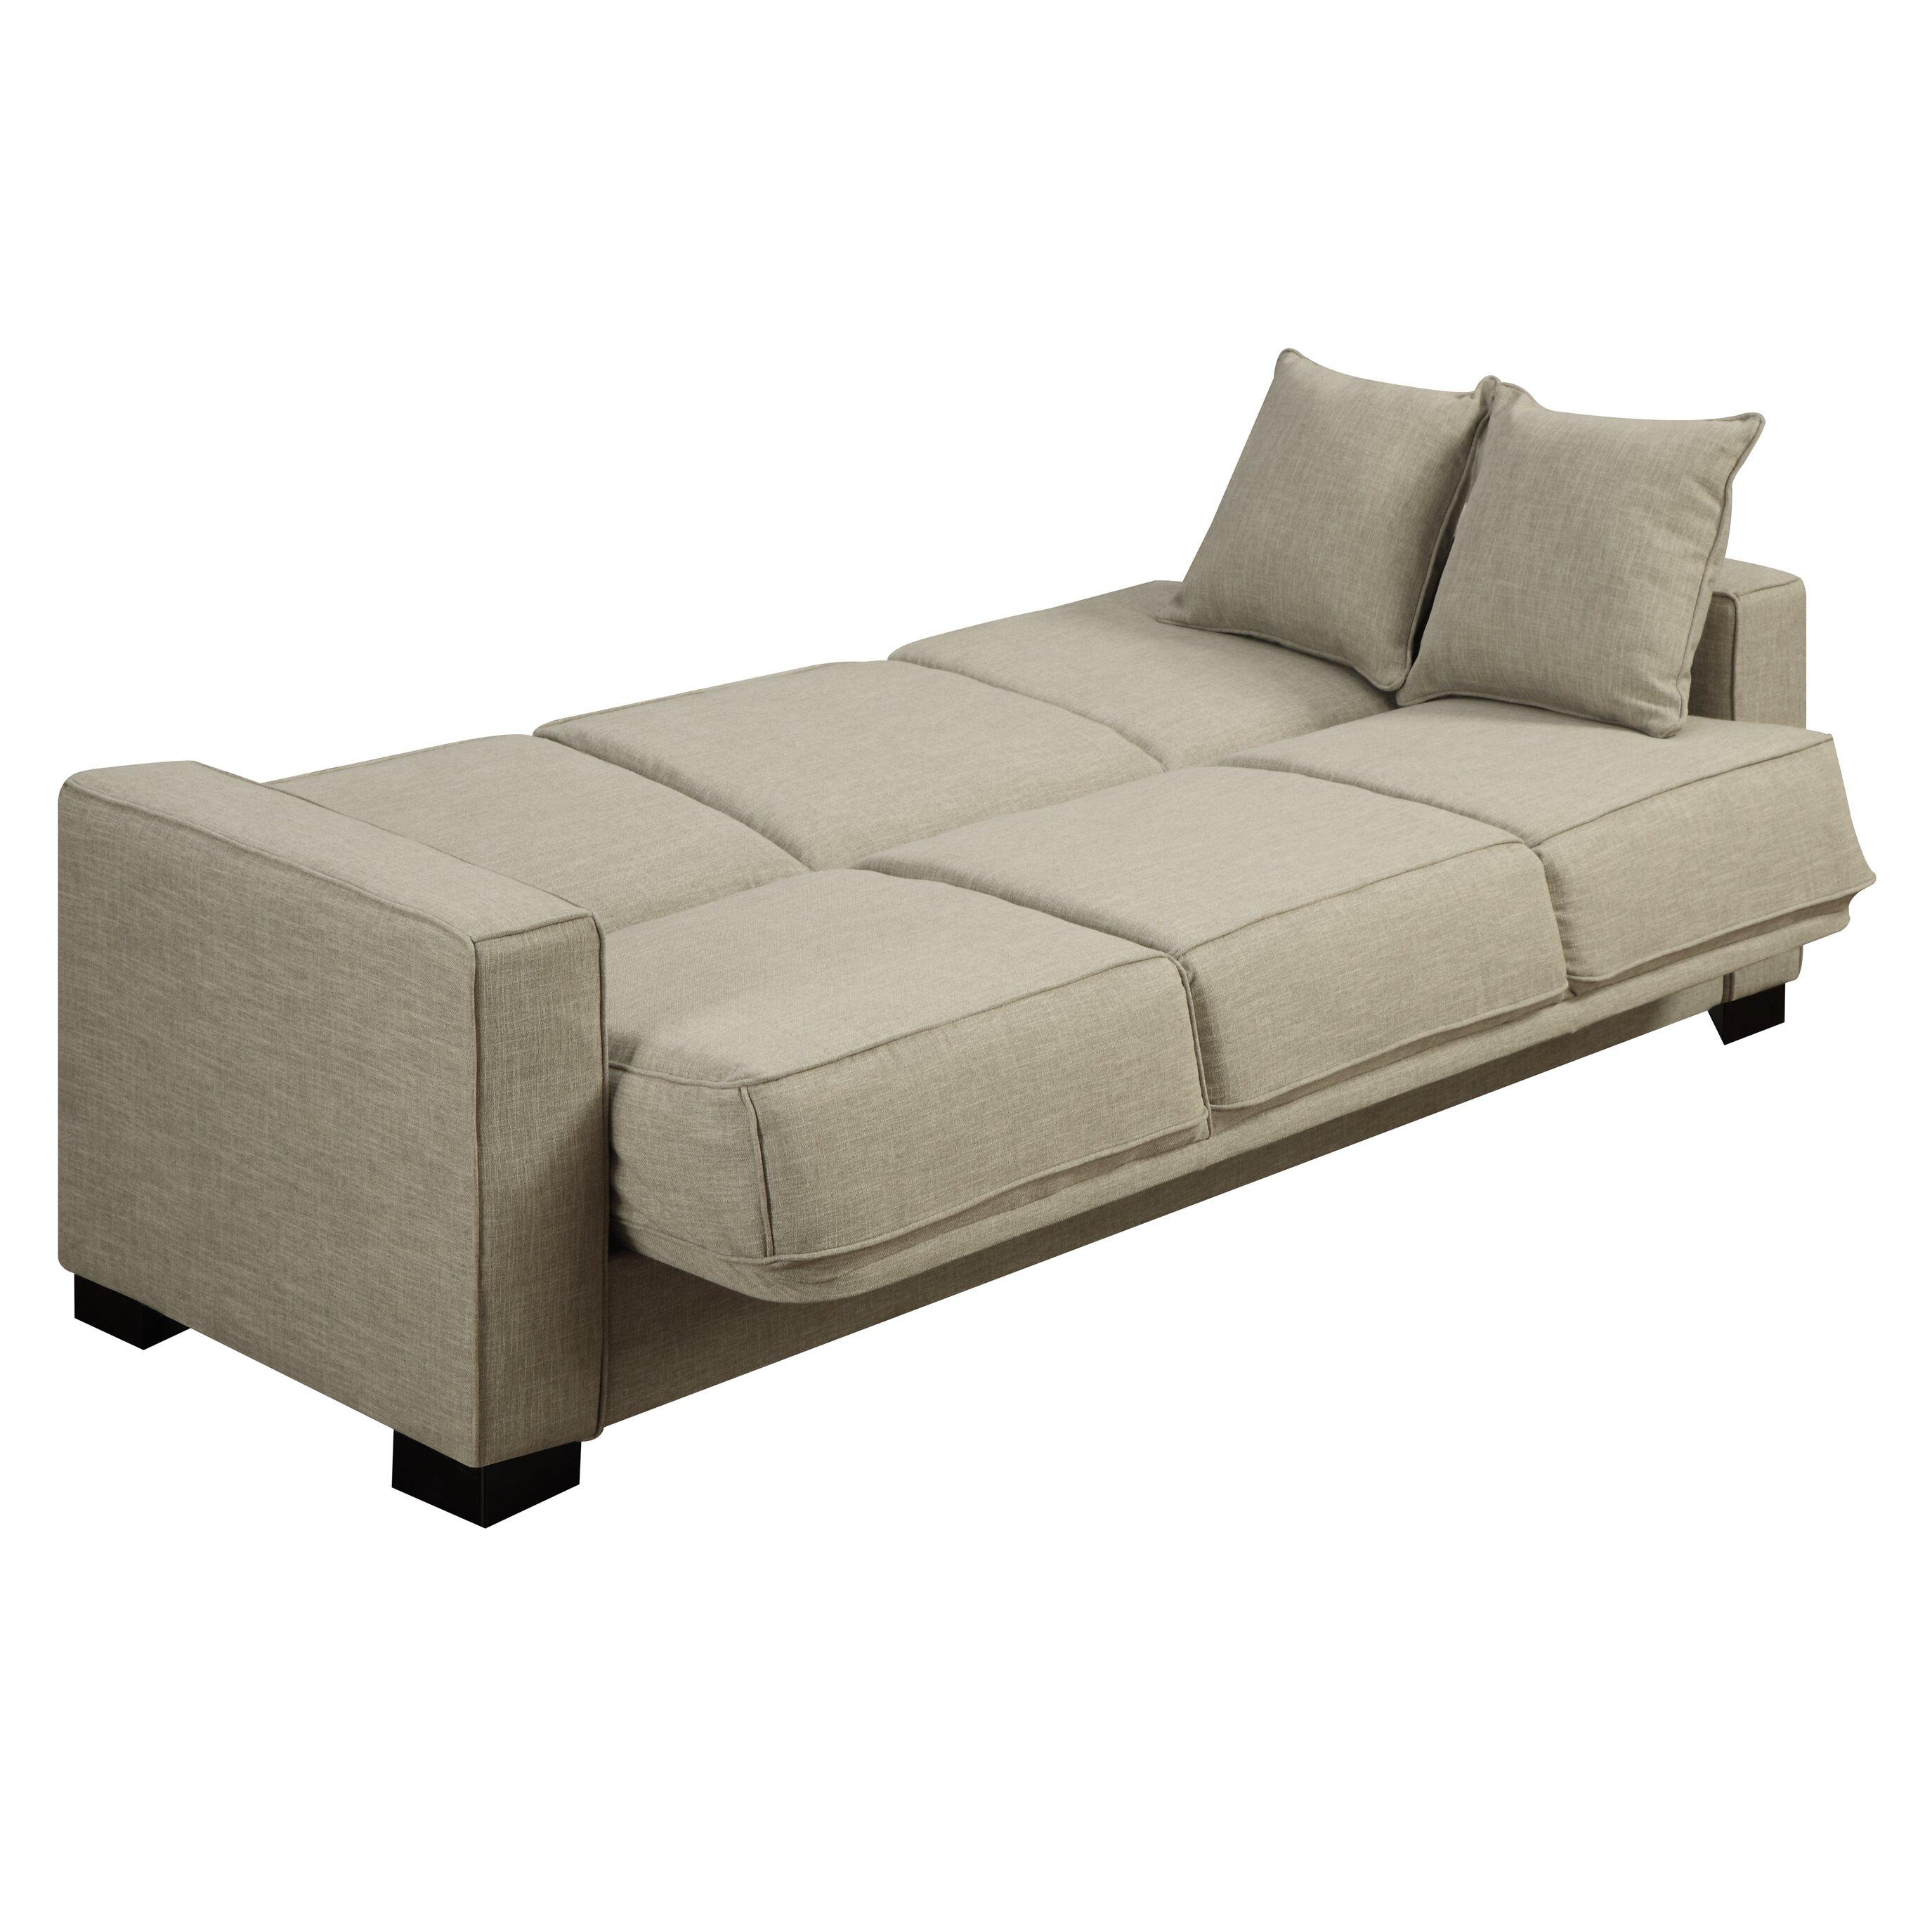 Kaylee Full Convertible Sleeper Sofa Wayfair